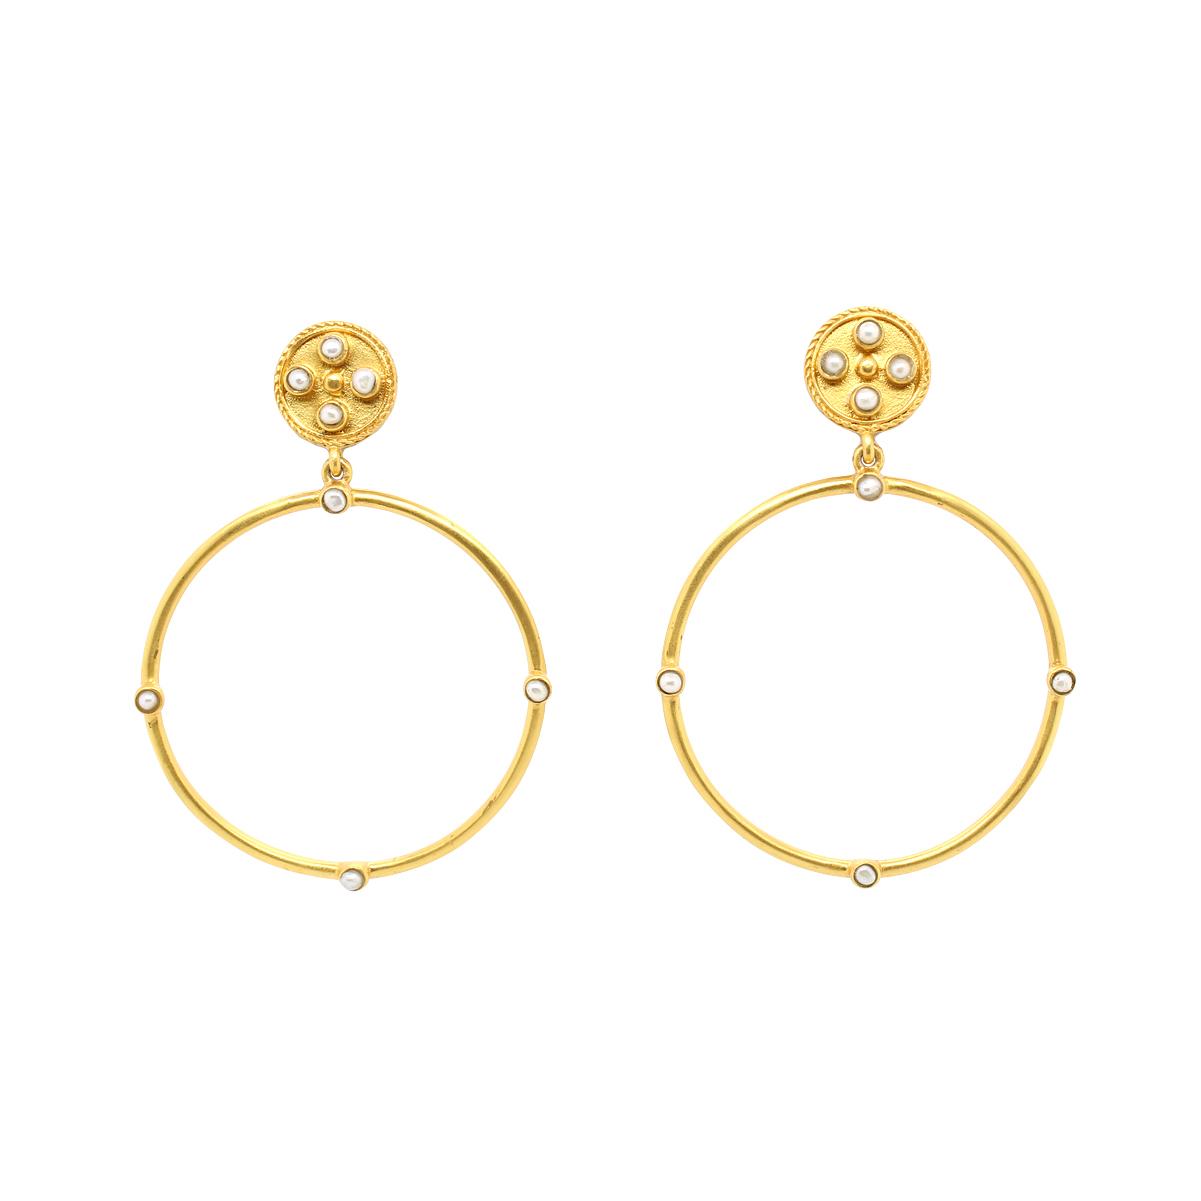 Julie Vos 24 Karat Gold Plated Paris Pearl Statement Earrings